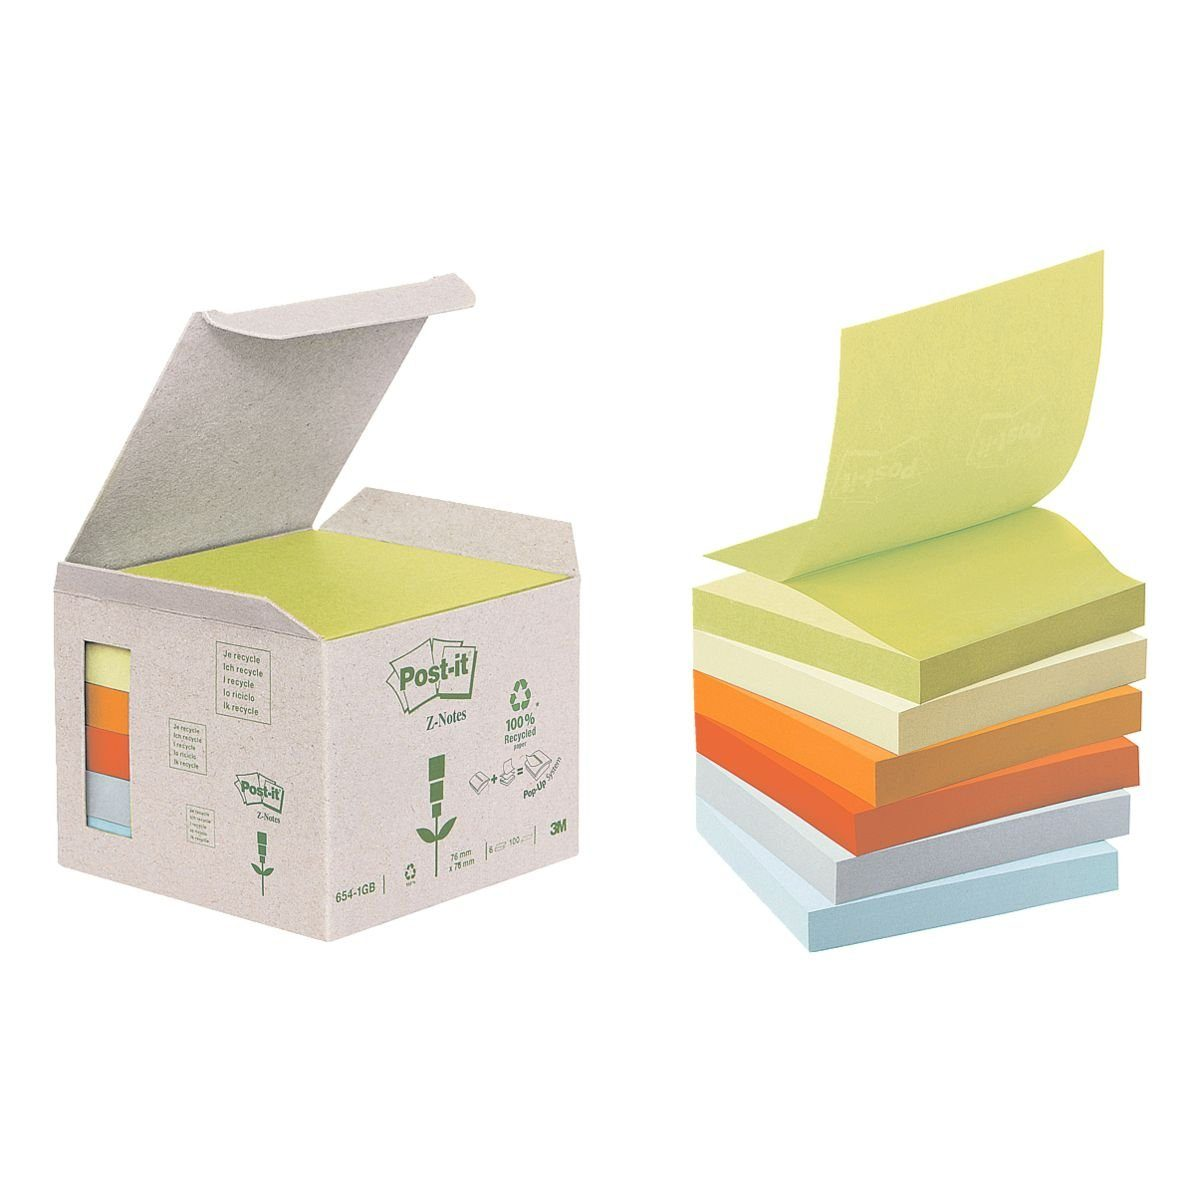 Post-it Notes (Recycle) Haftnotizblock 7,6 x 7,6 cm, 6 Stück »Recycling Z-Notes«